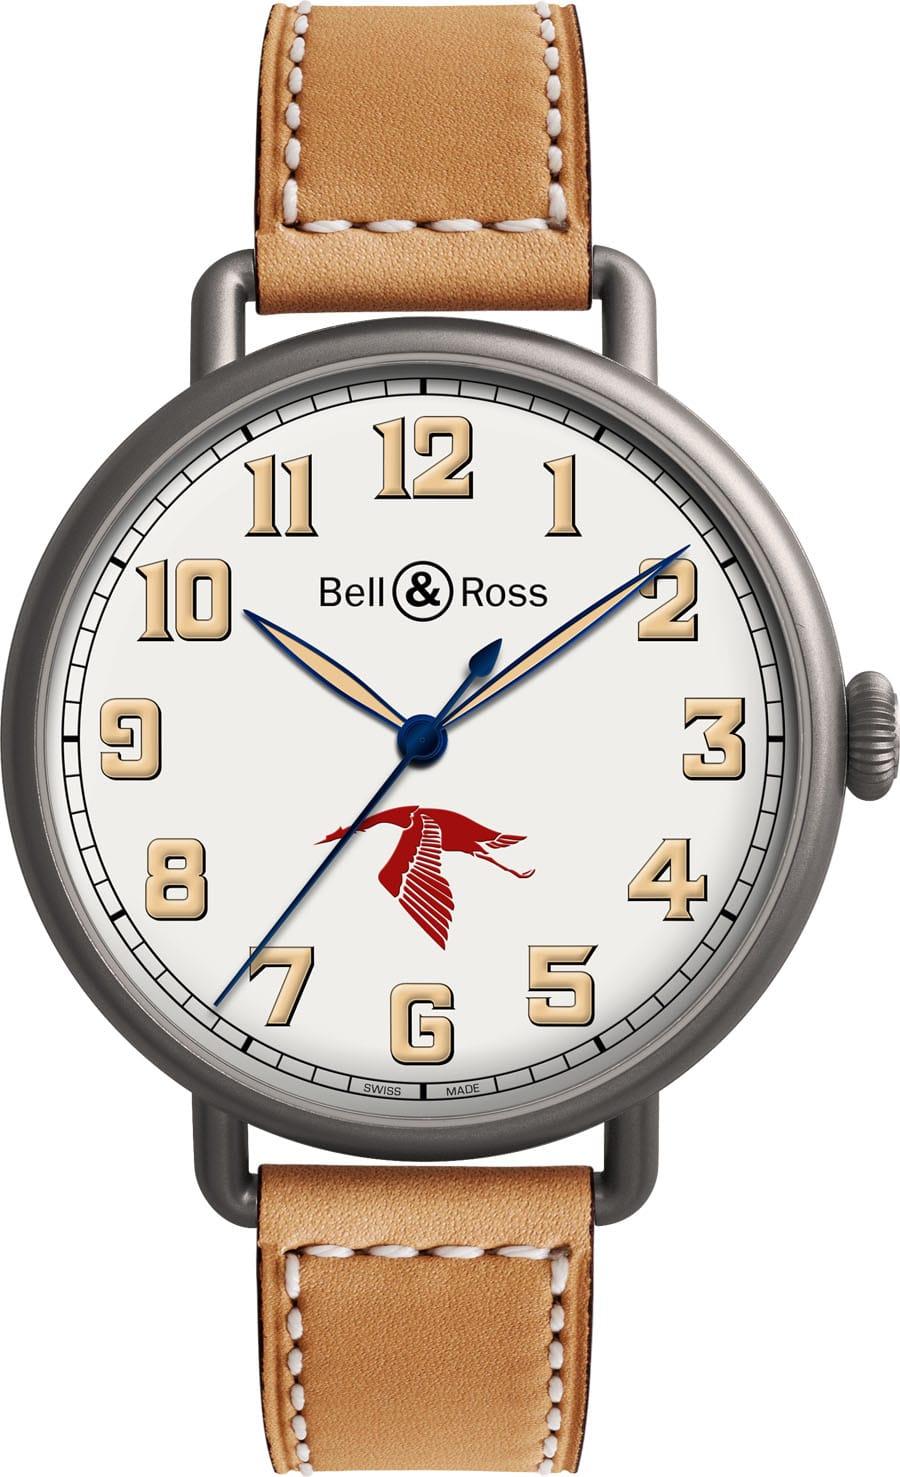 Bell & Ross: Vintage WW1 Guynemer